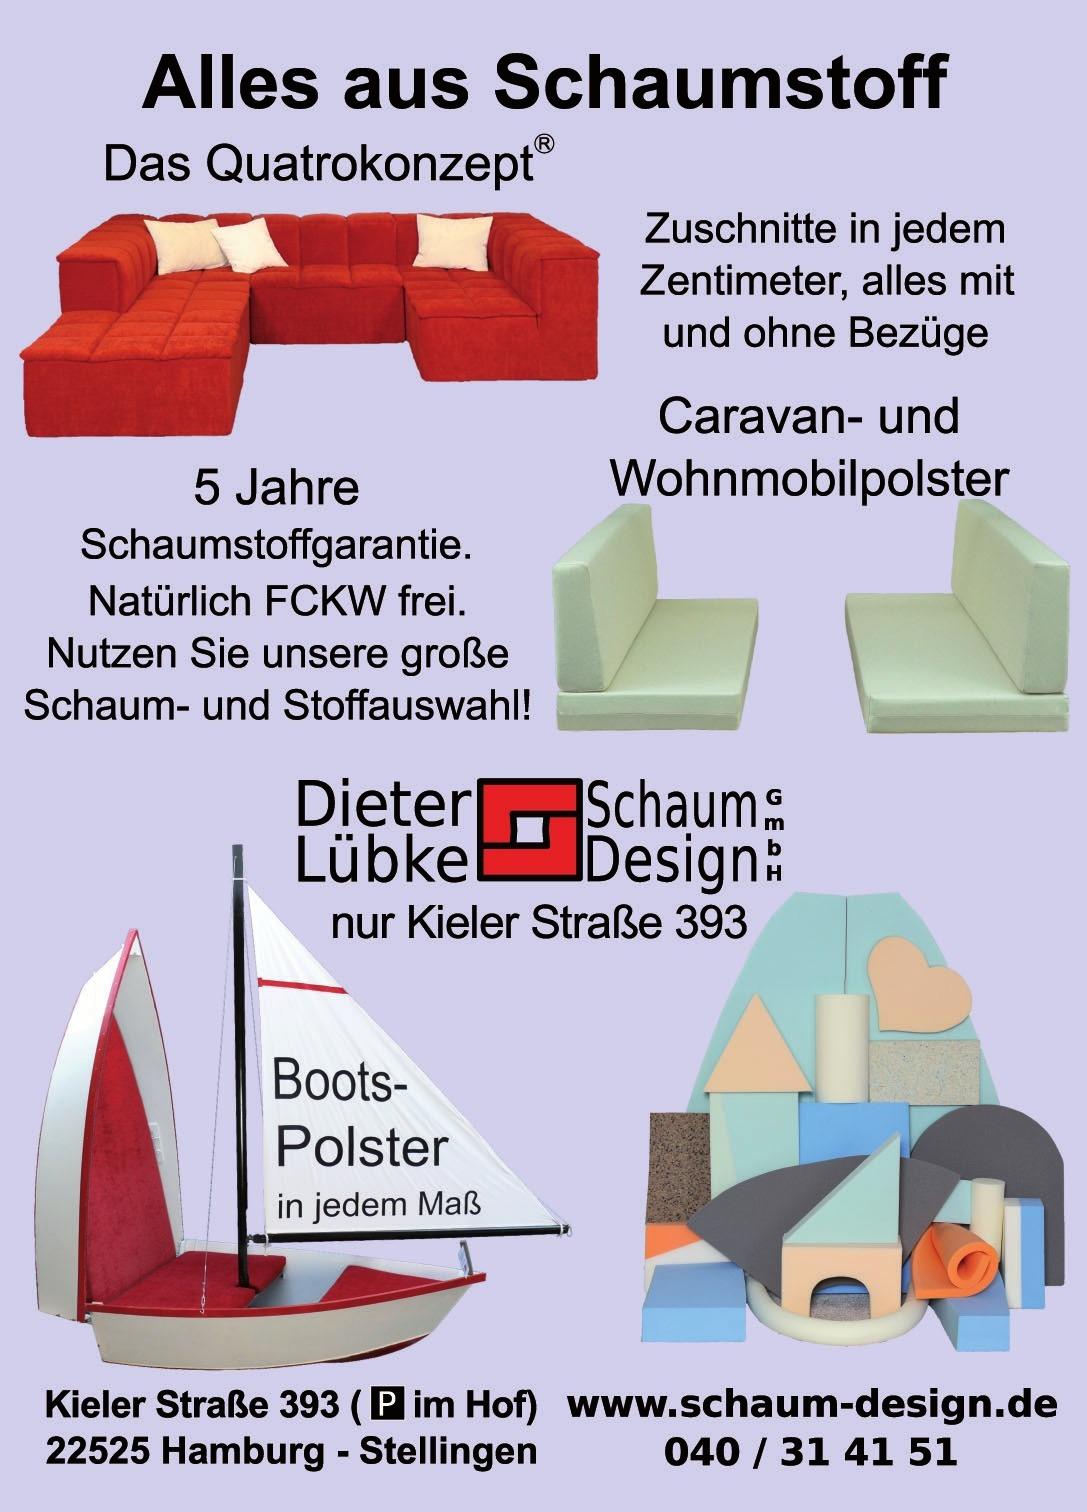 Schaum Design